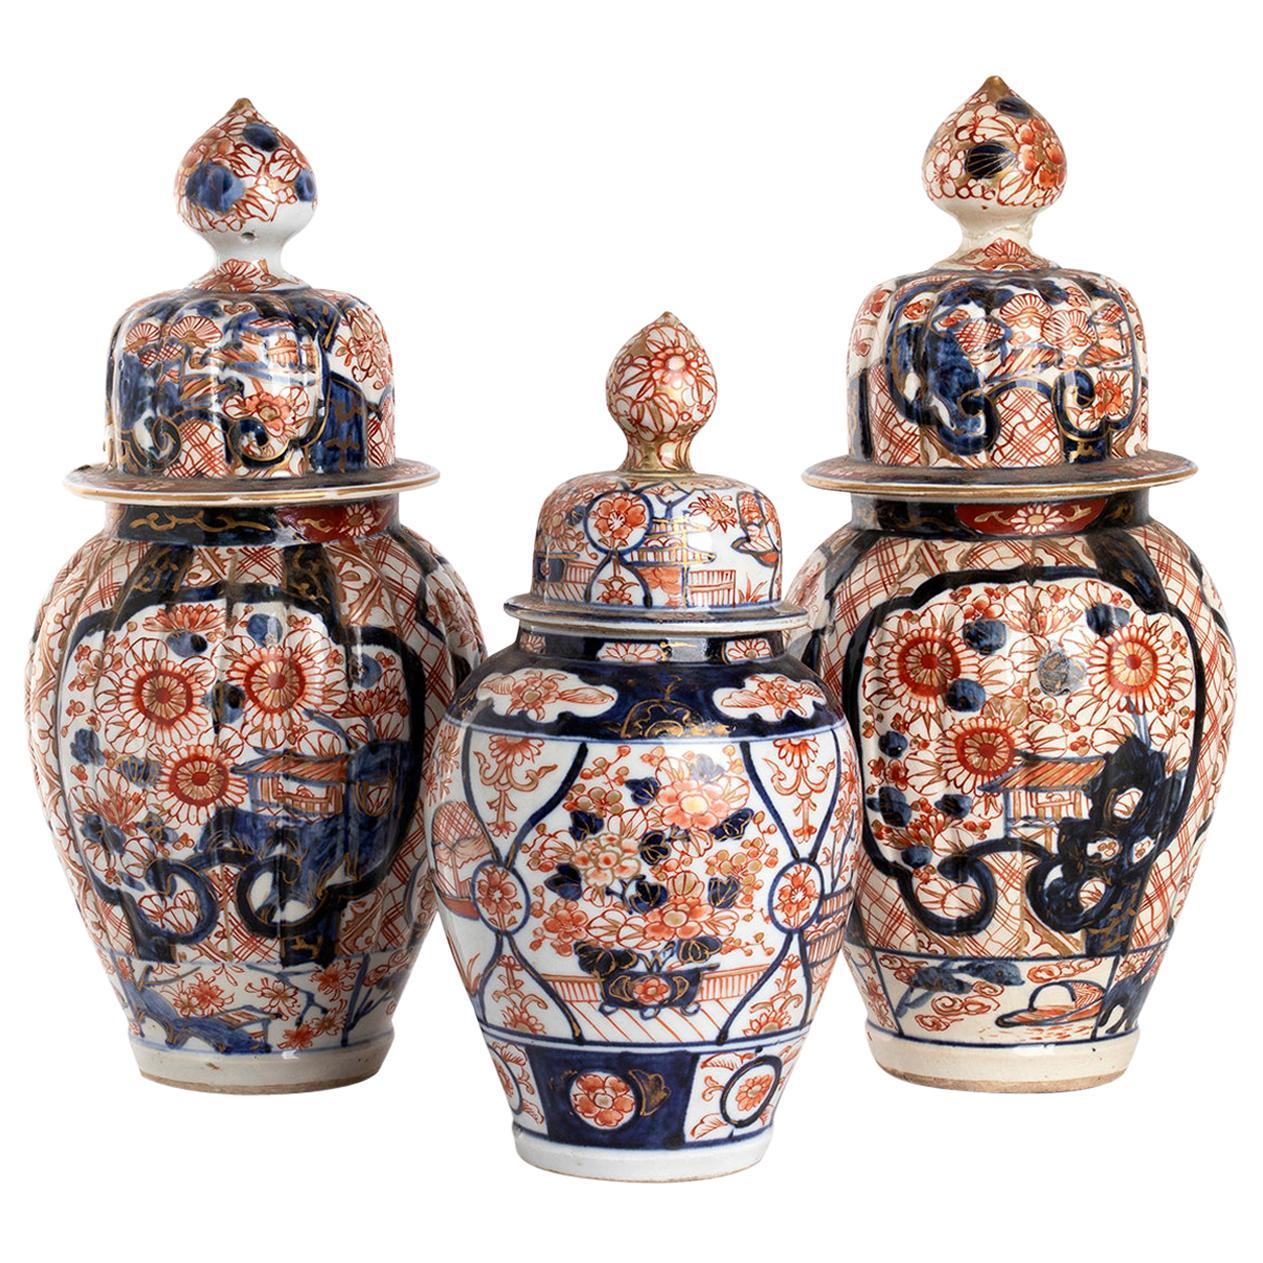 Three Japanese Imari Vases, Early 20th Century